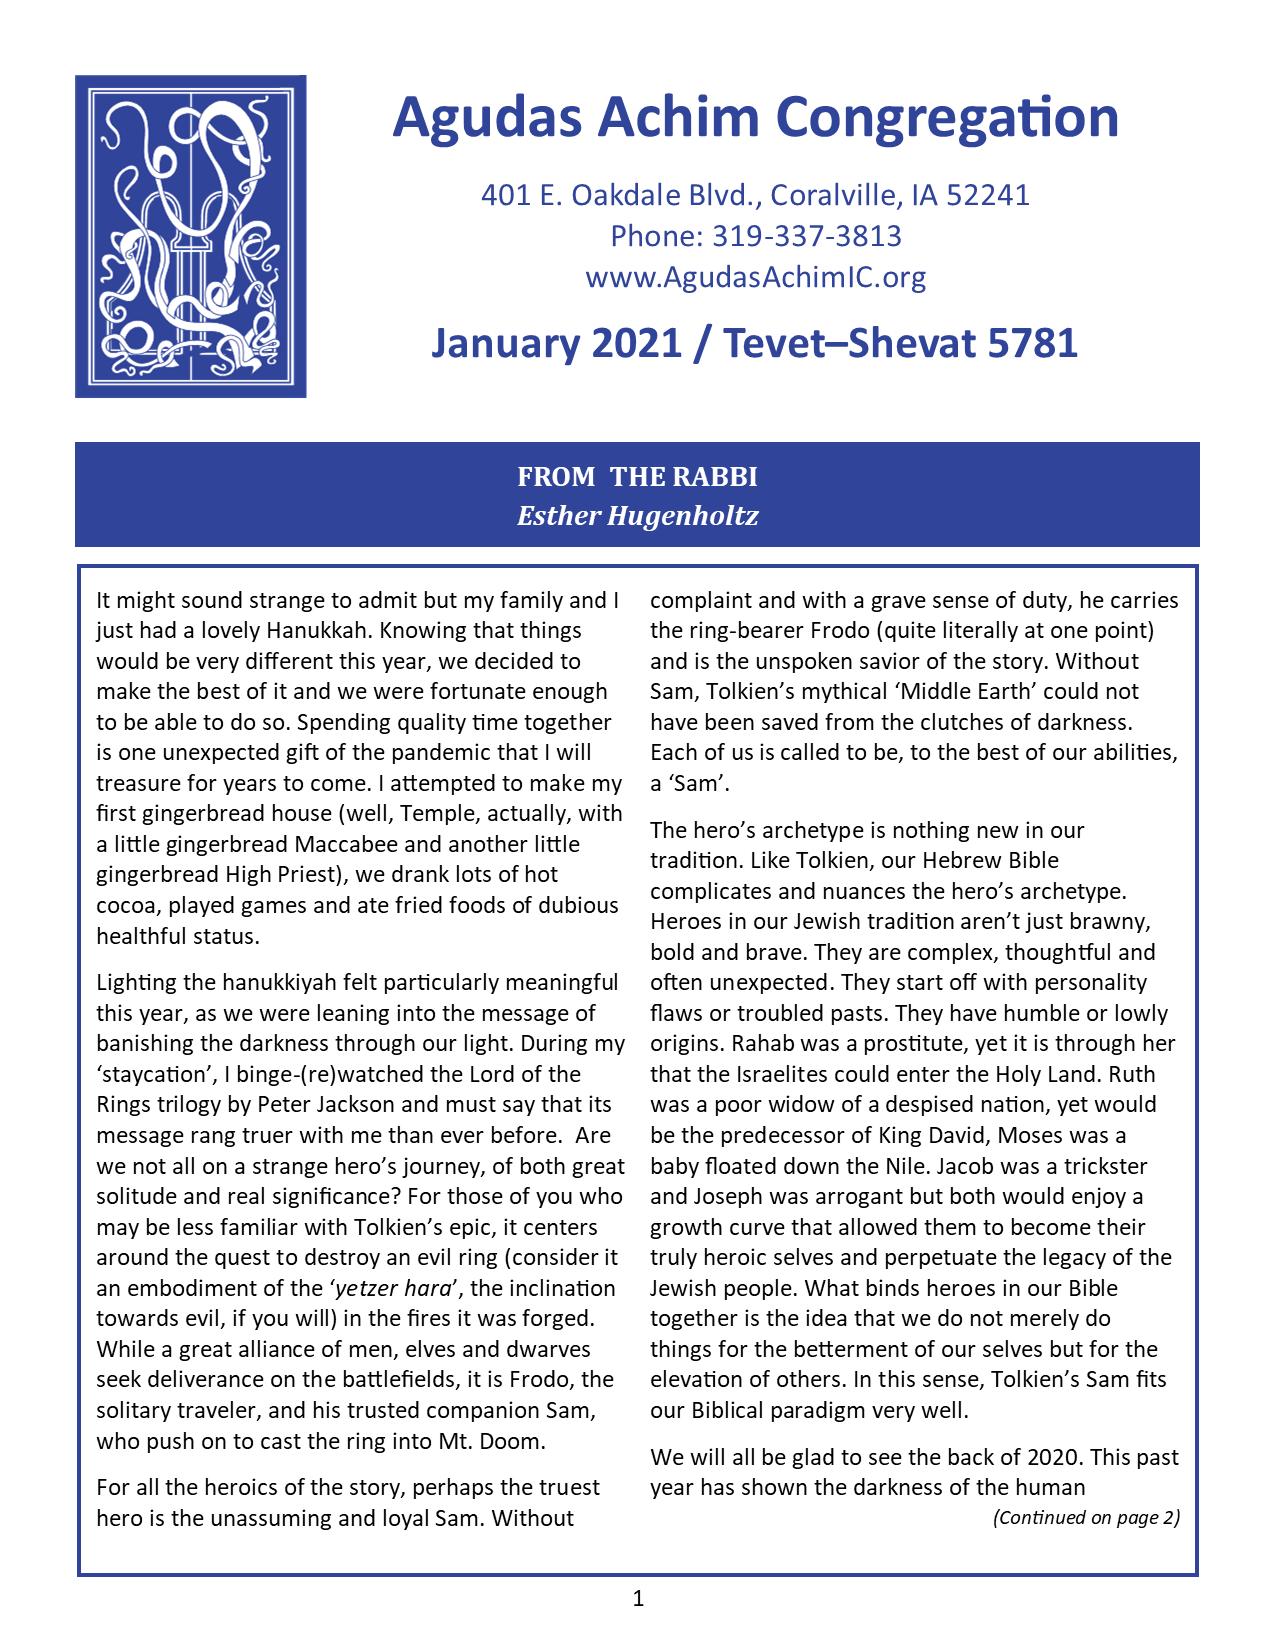 January 2021 Bulletin Cover